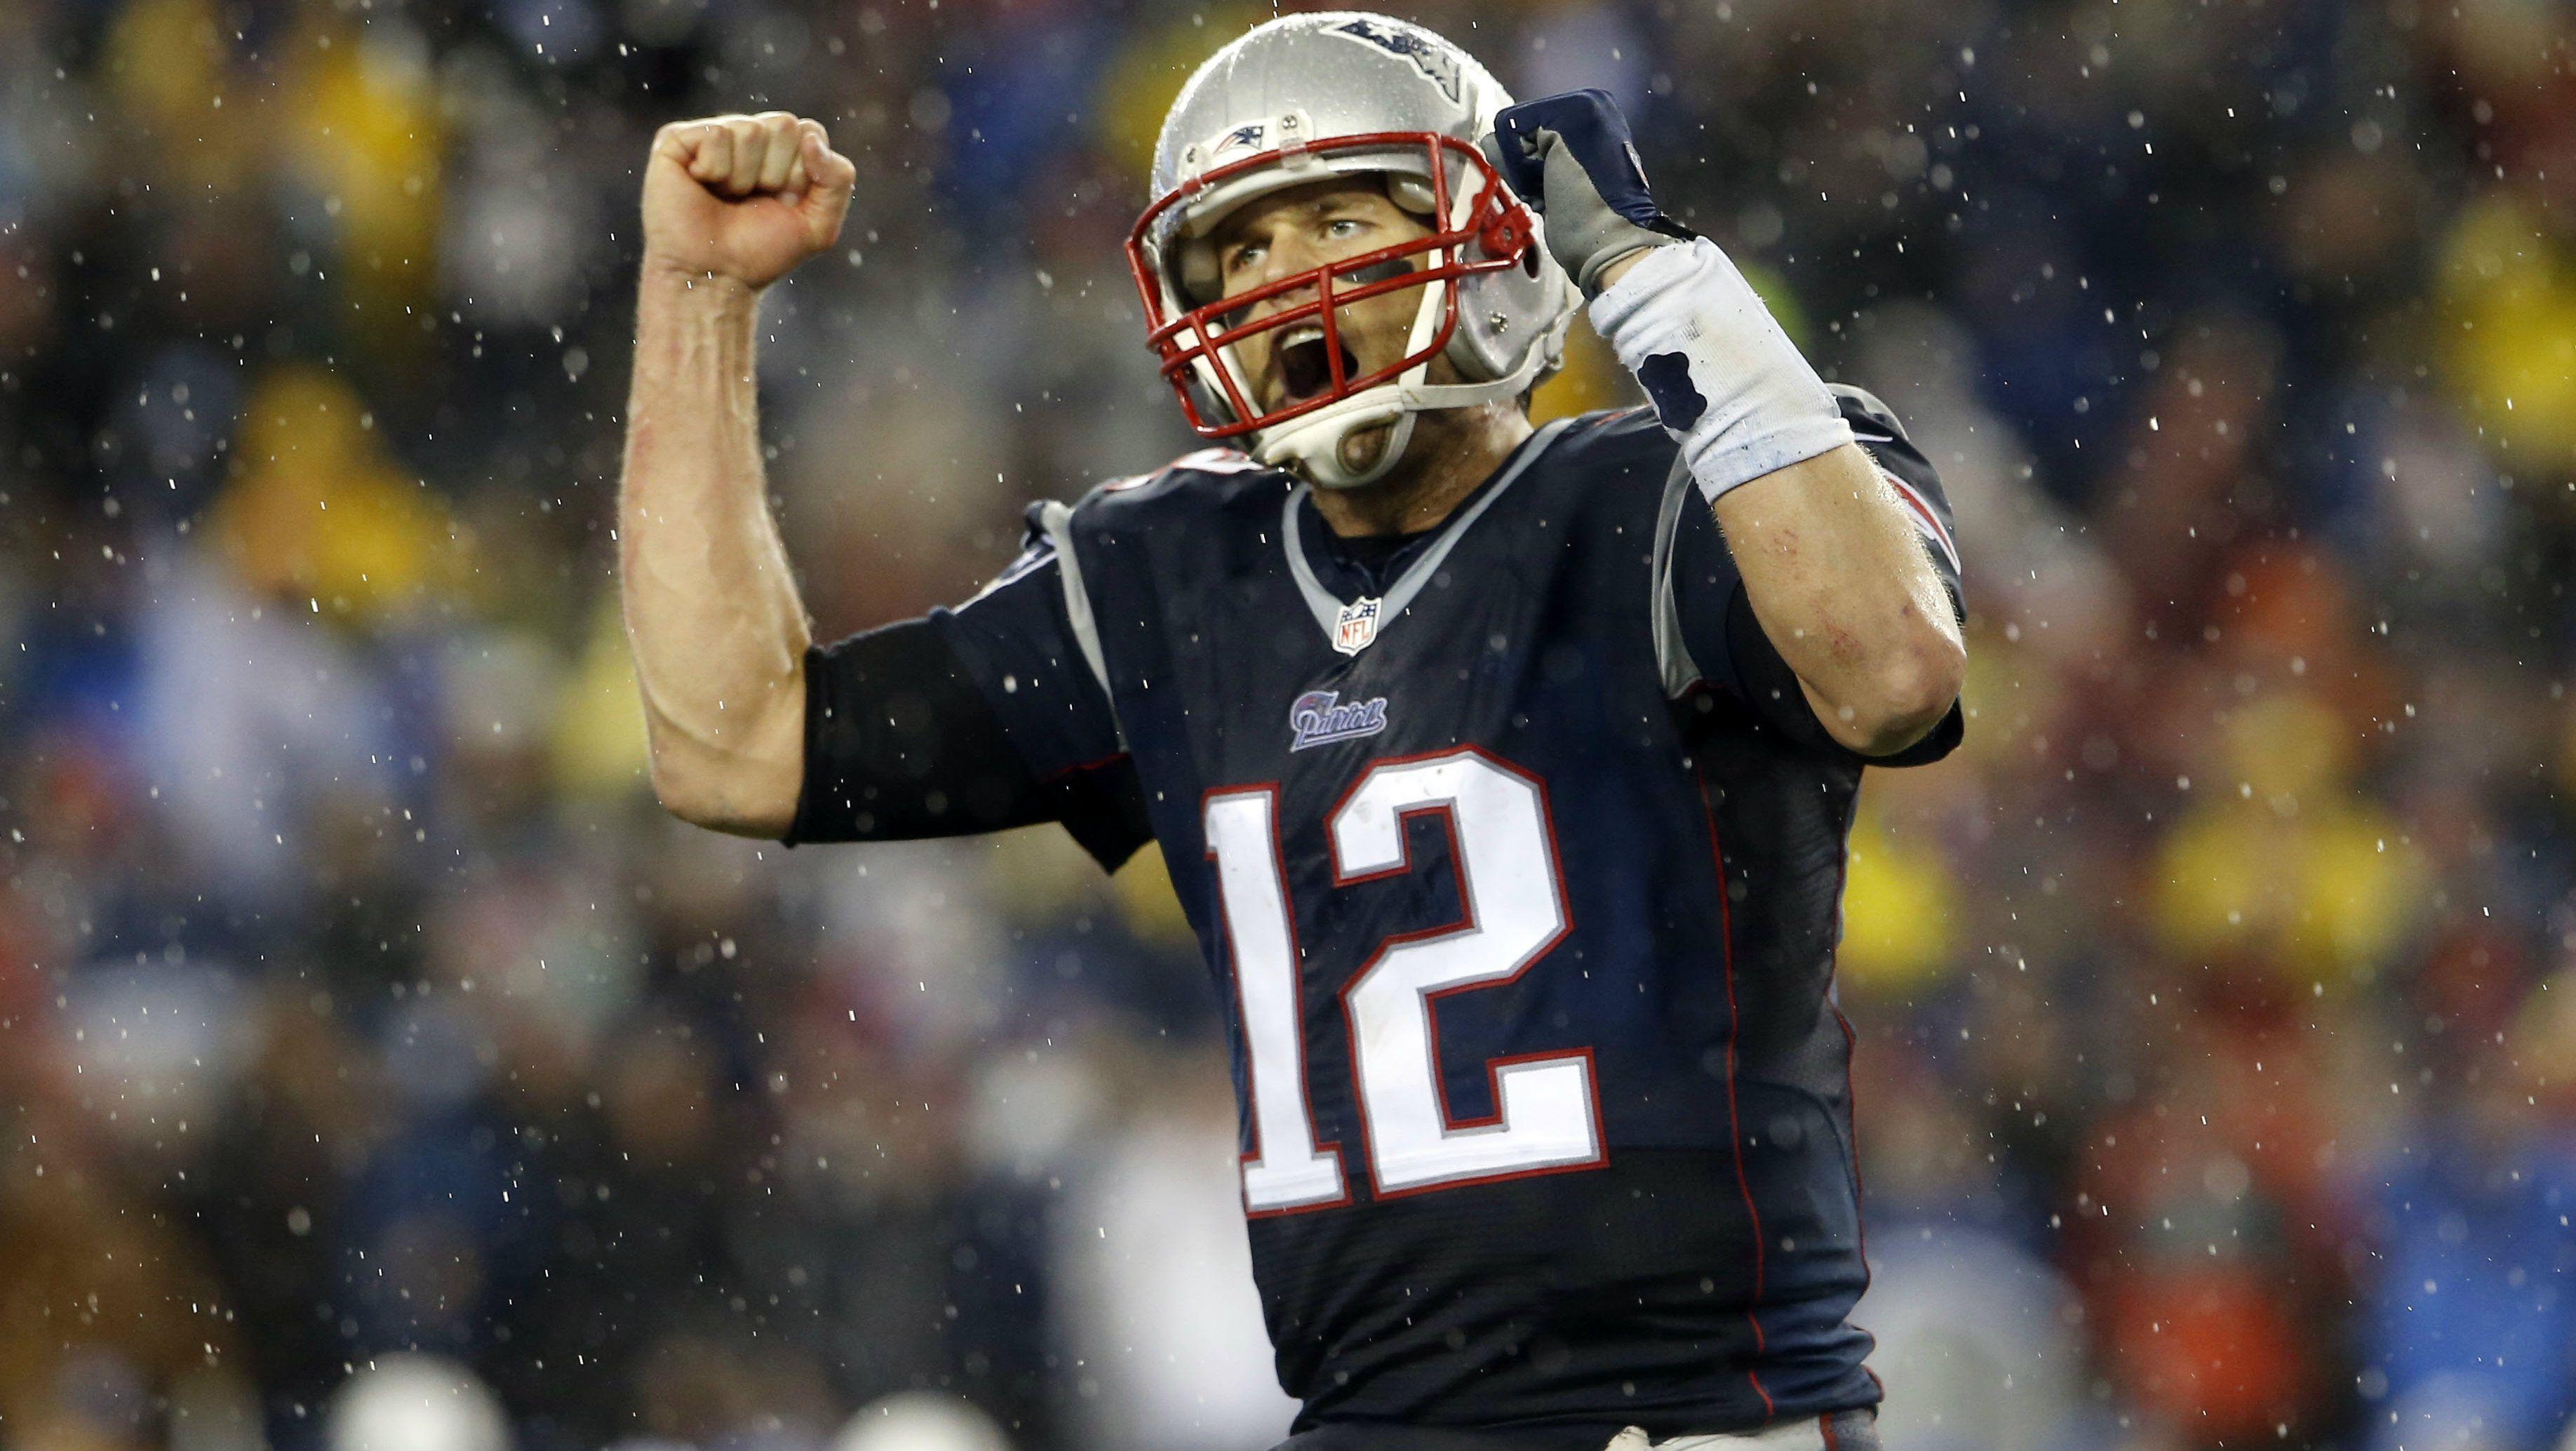 Tom Brady, of the NFL's New England Patriots